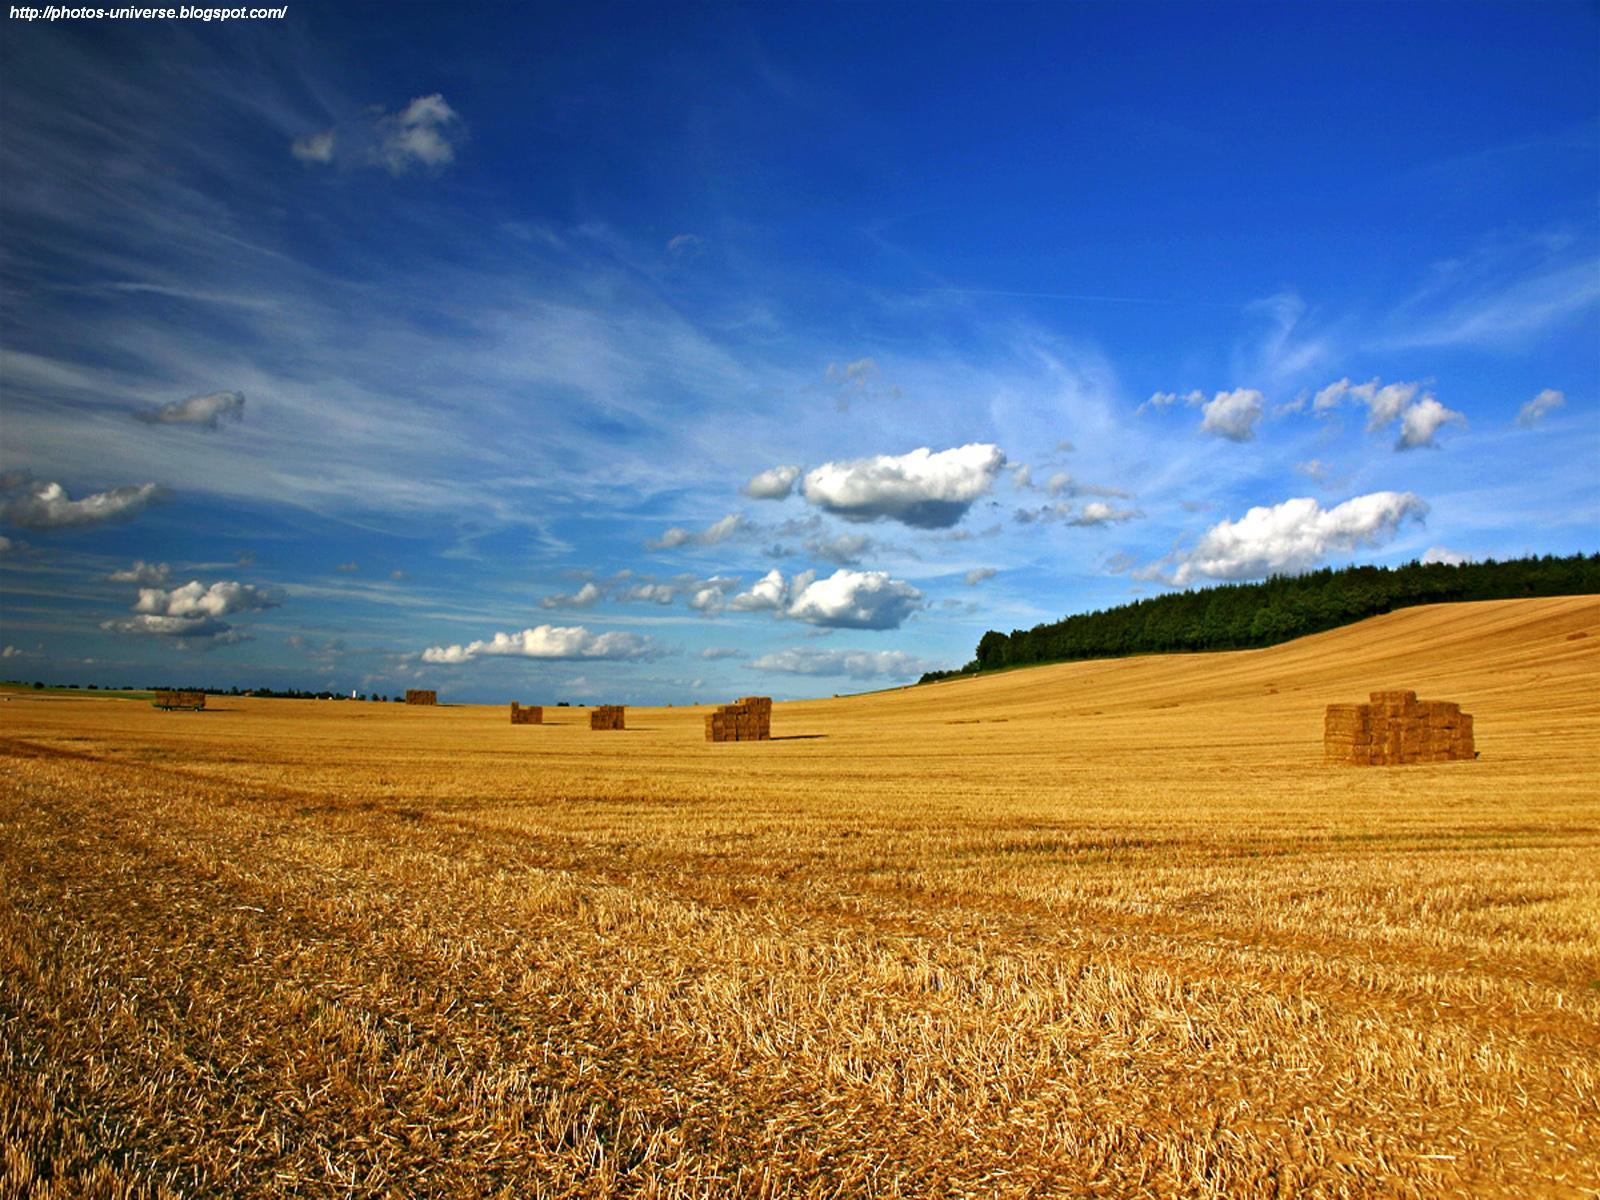 Club 4 Buzz: Crops & Field Wallpapers